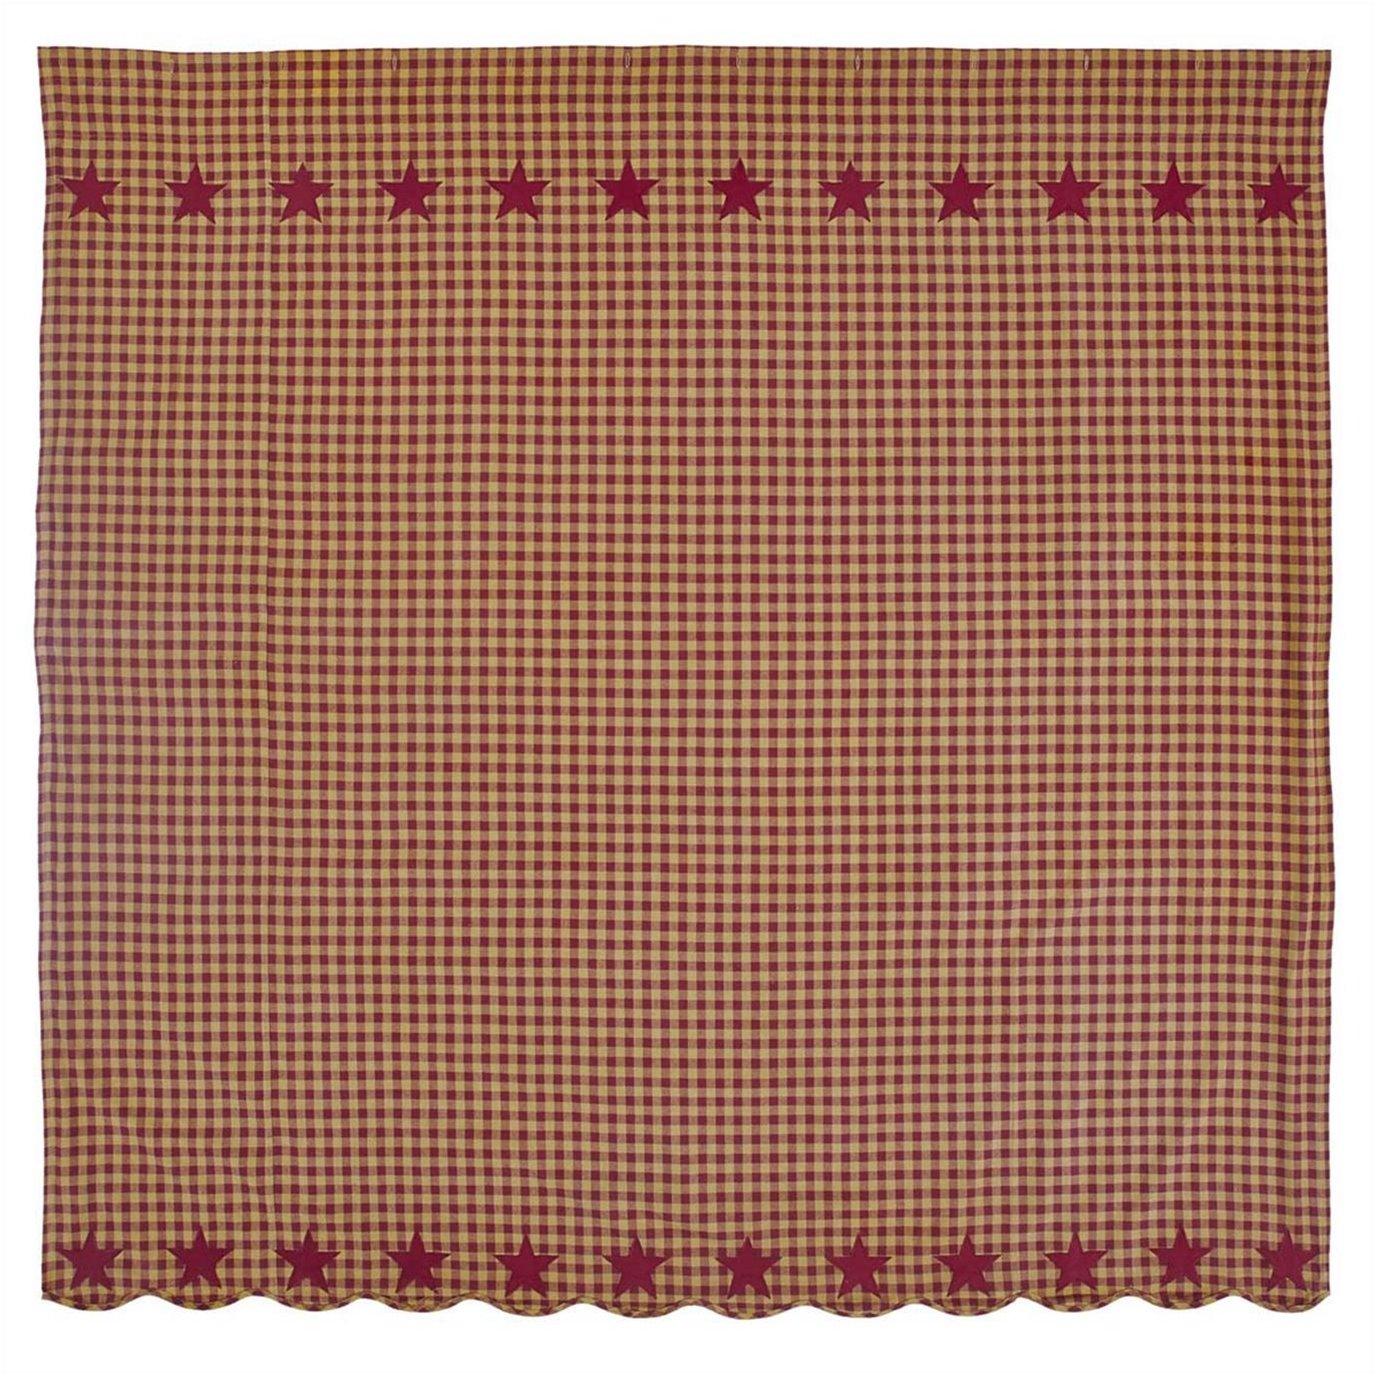 Burgundy Star Scalloped Shower Curtain 72x72